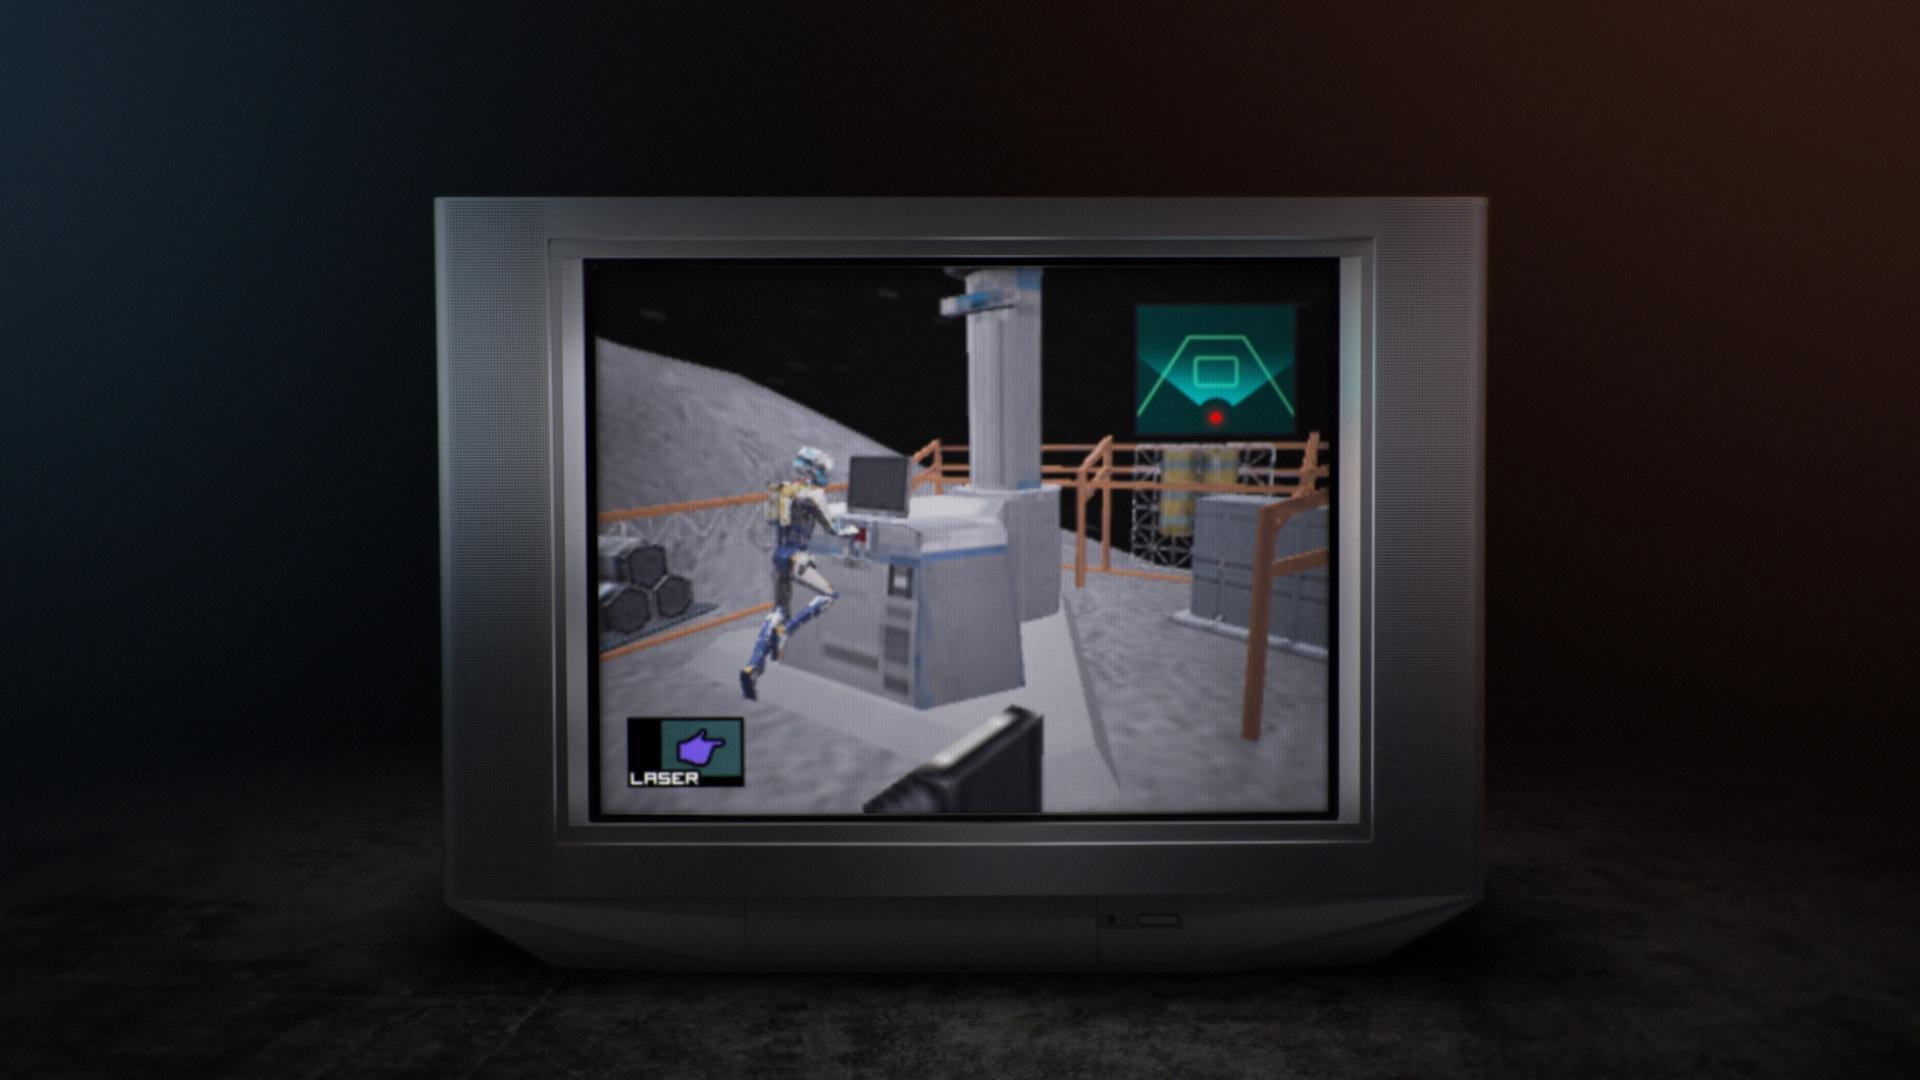 OCU-075_GameAwardsTrailer_1920x1080p_30fps_ProRes422HQ_ST_24Bit_48kHz_-16LKFS (108490).jpg